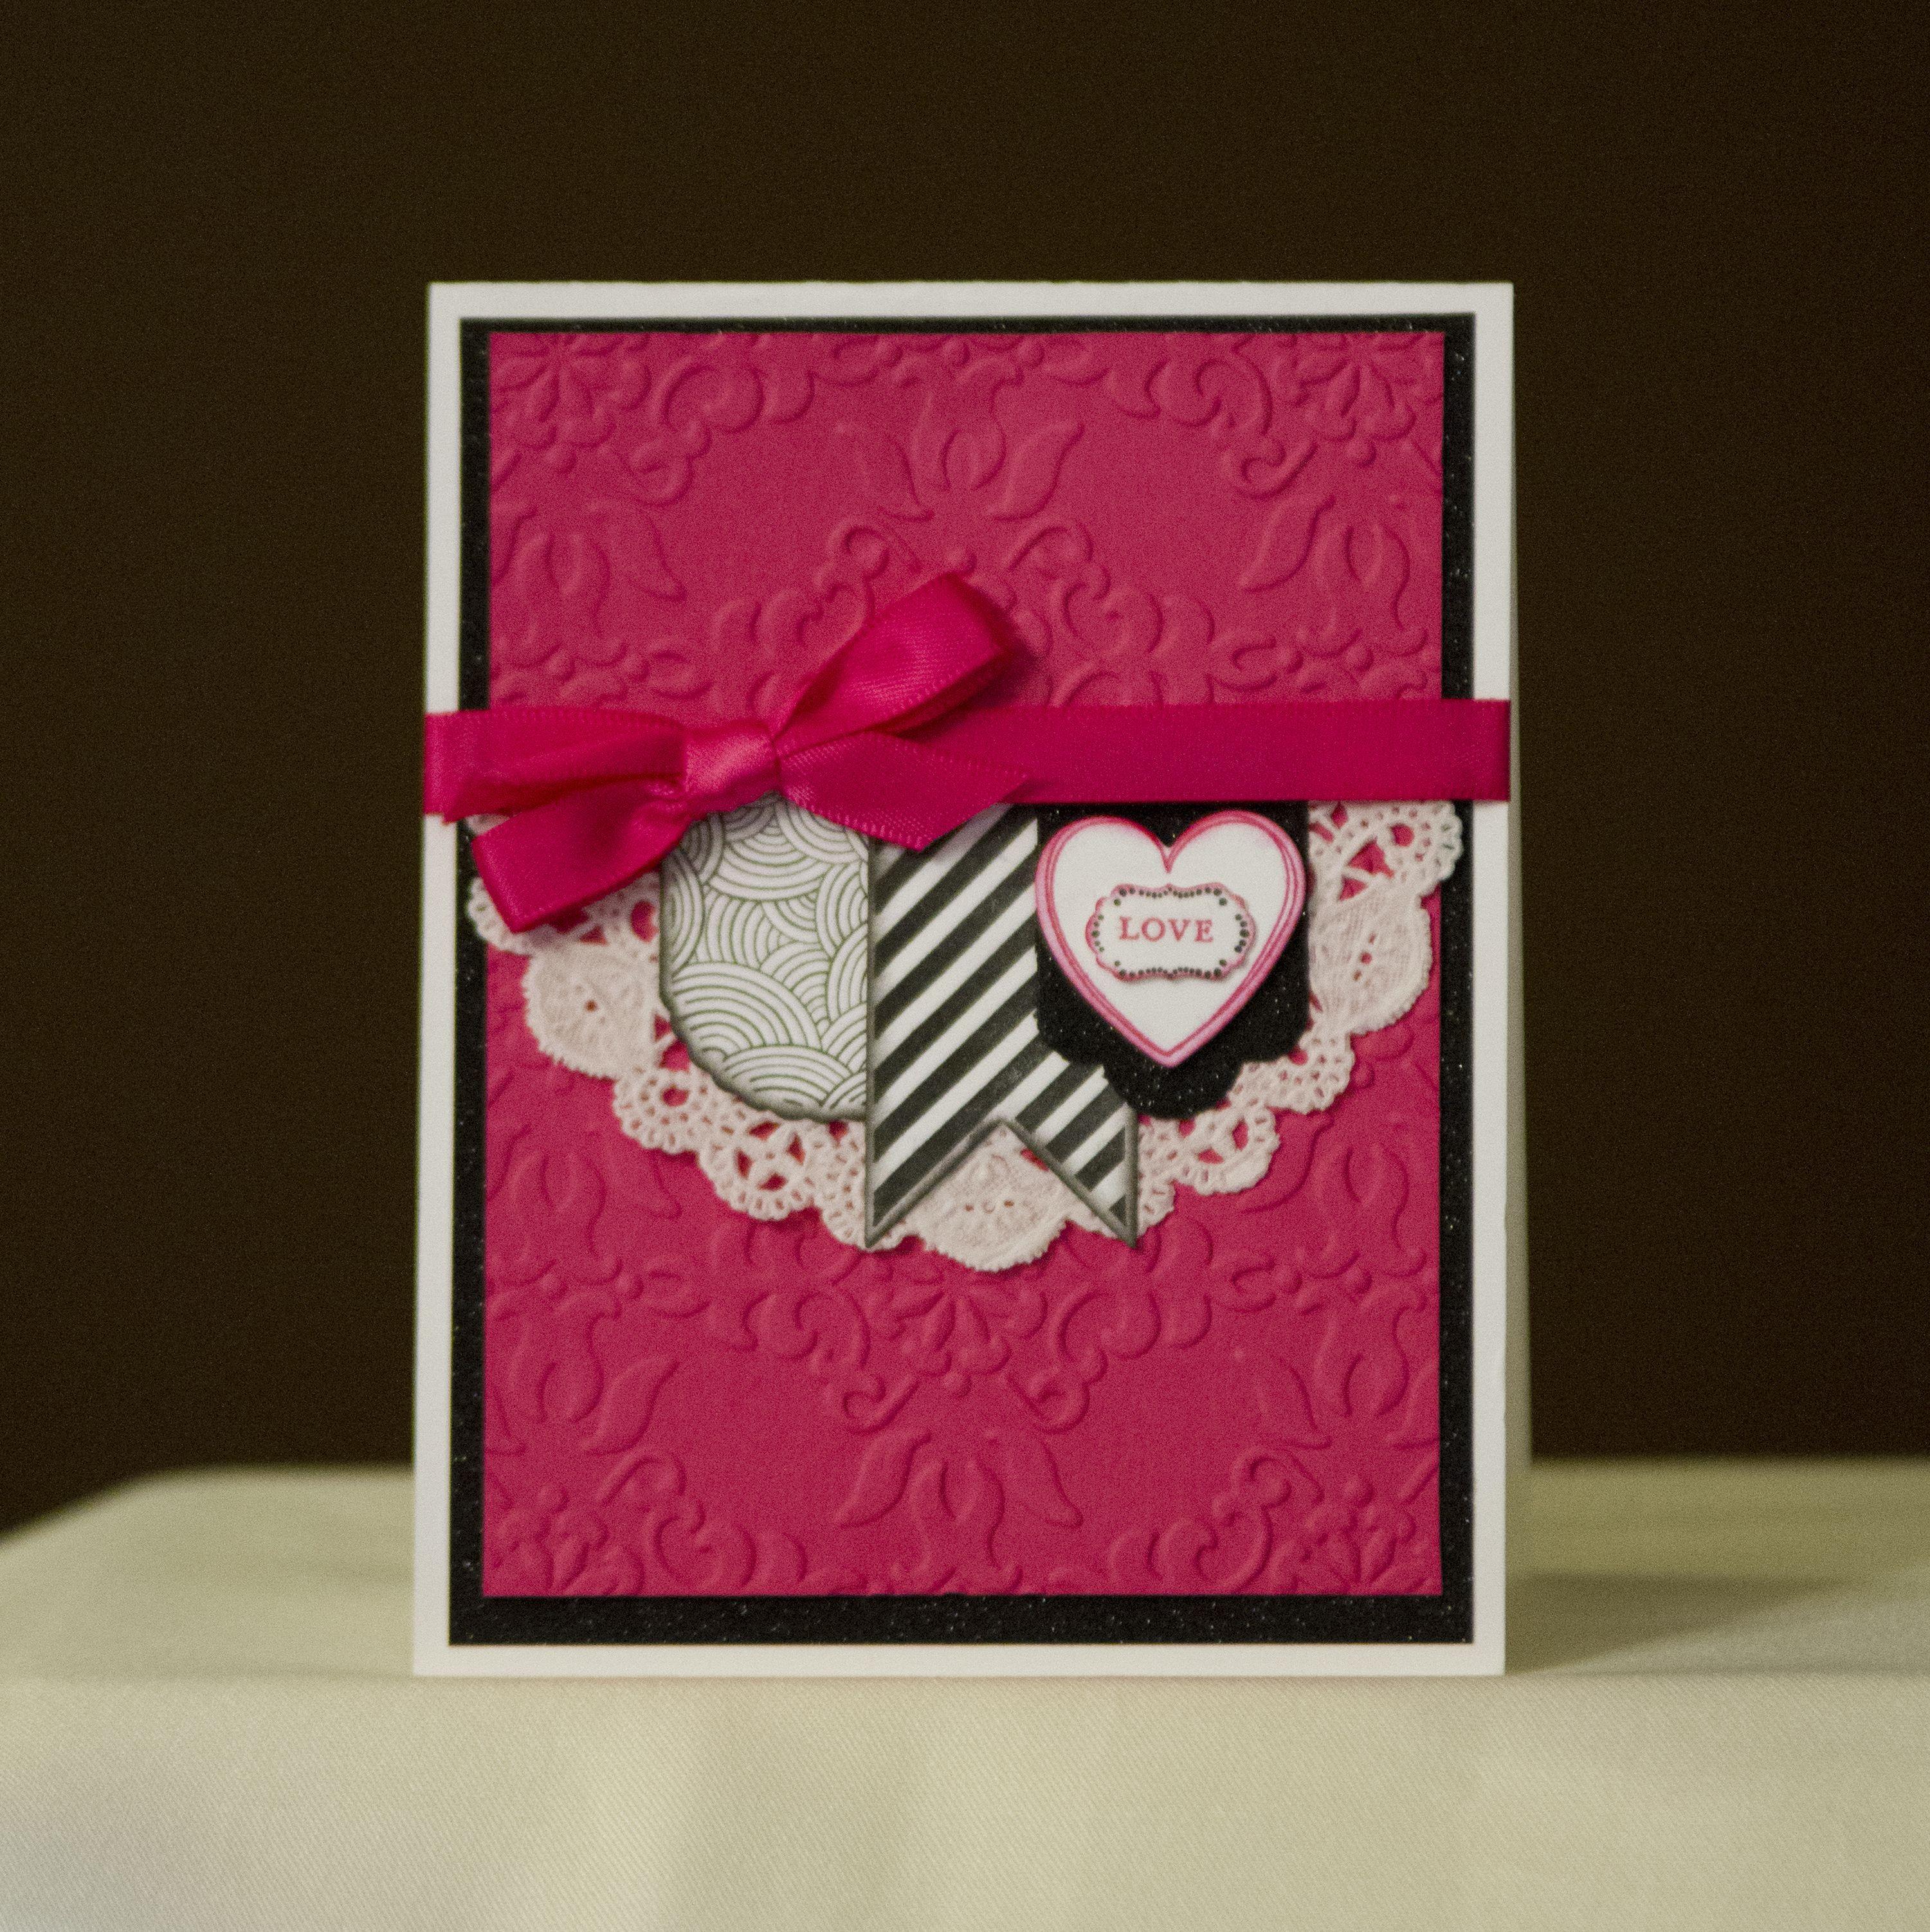 Custom and Handmade Wedding Invitation - Hot Pink, Black and White. #wedding #invitation #custom #handmade #love #doily #onceinalifetime #ido #bride #groom #pnwwedding #weddings #washingtonwedding #washington #rustic #ribbon #emboss  To purchase custom invitations please visit my Etsy store:  www.fmnpaperie.etsy.com